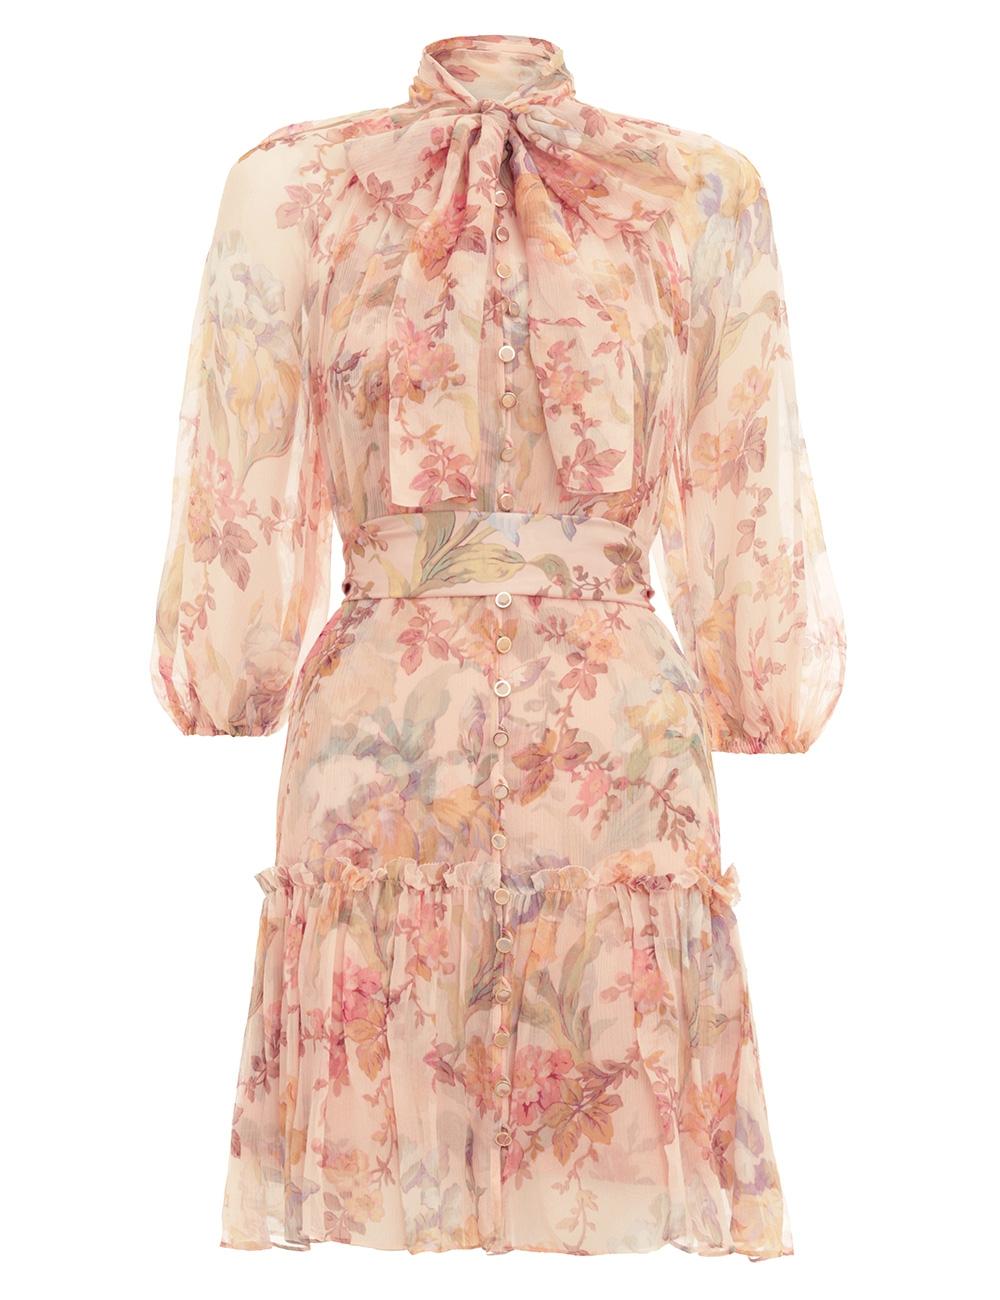 7362a007eb12 Shop Designer Dresses Online | ZIMMERMANN